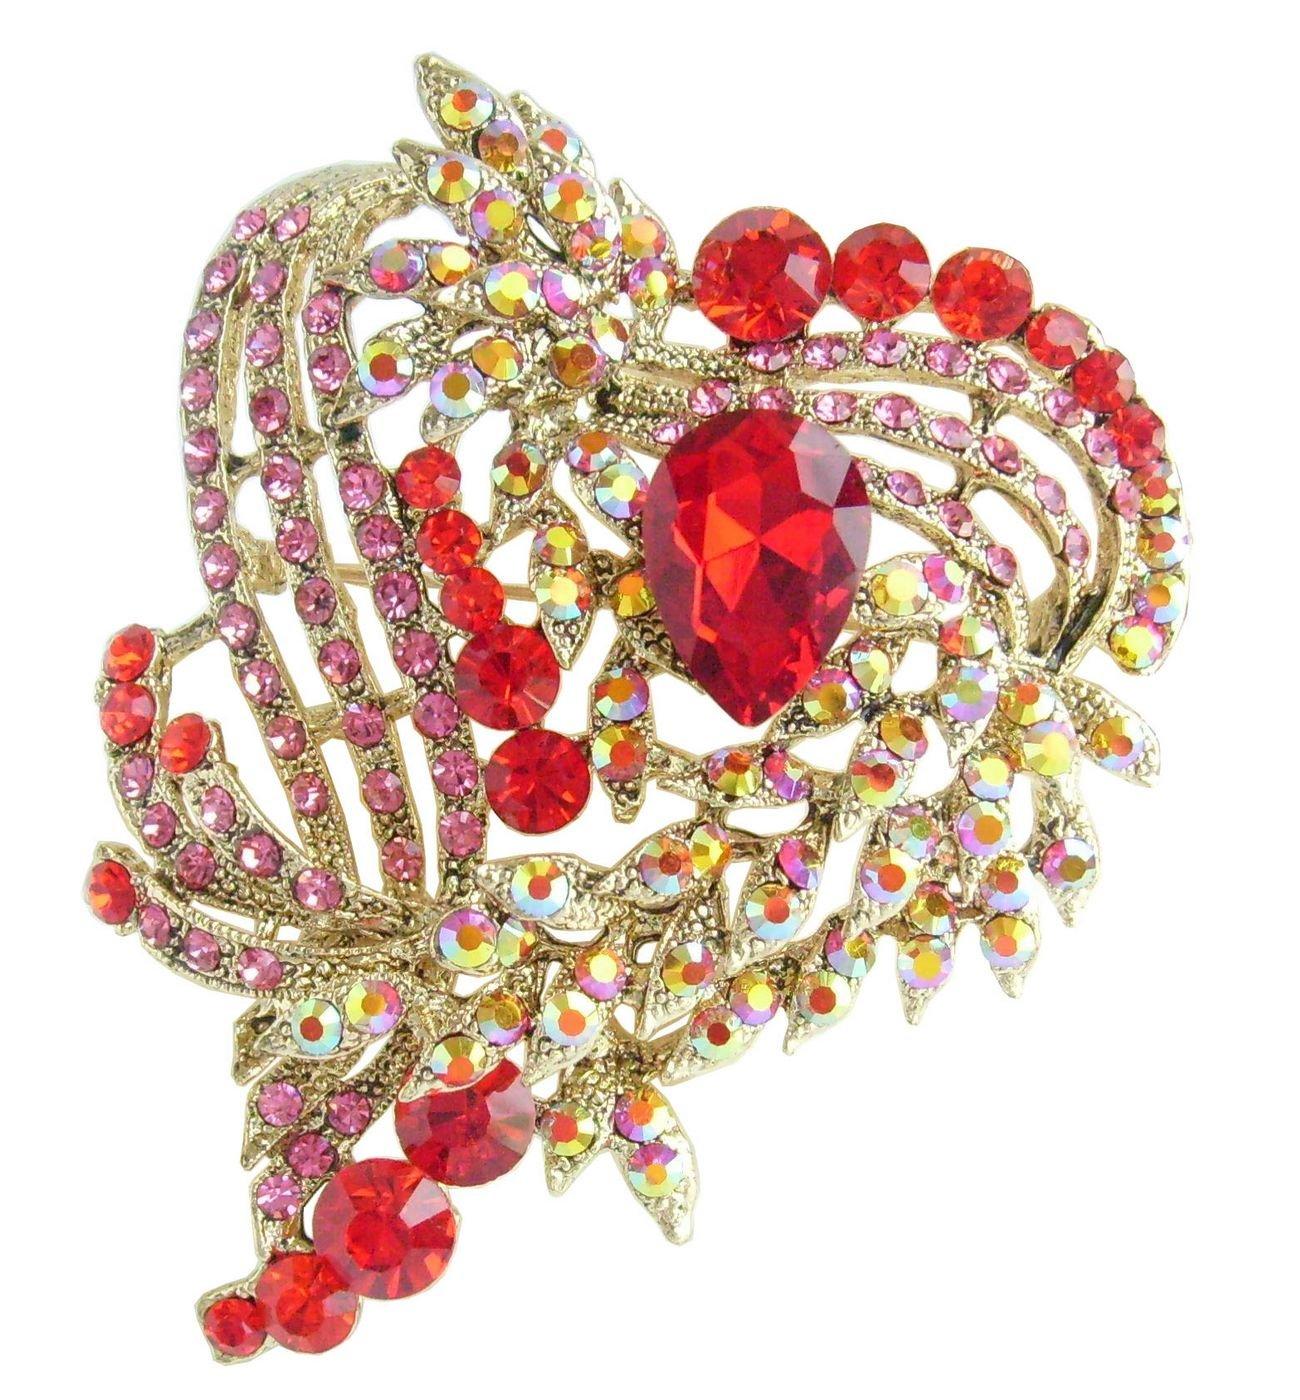 3.15'' Love Heart Brooch Pin Pendant Rhinestone Crystal BZ5652 (Gold-Tone Red)